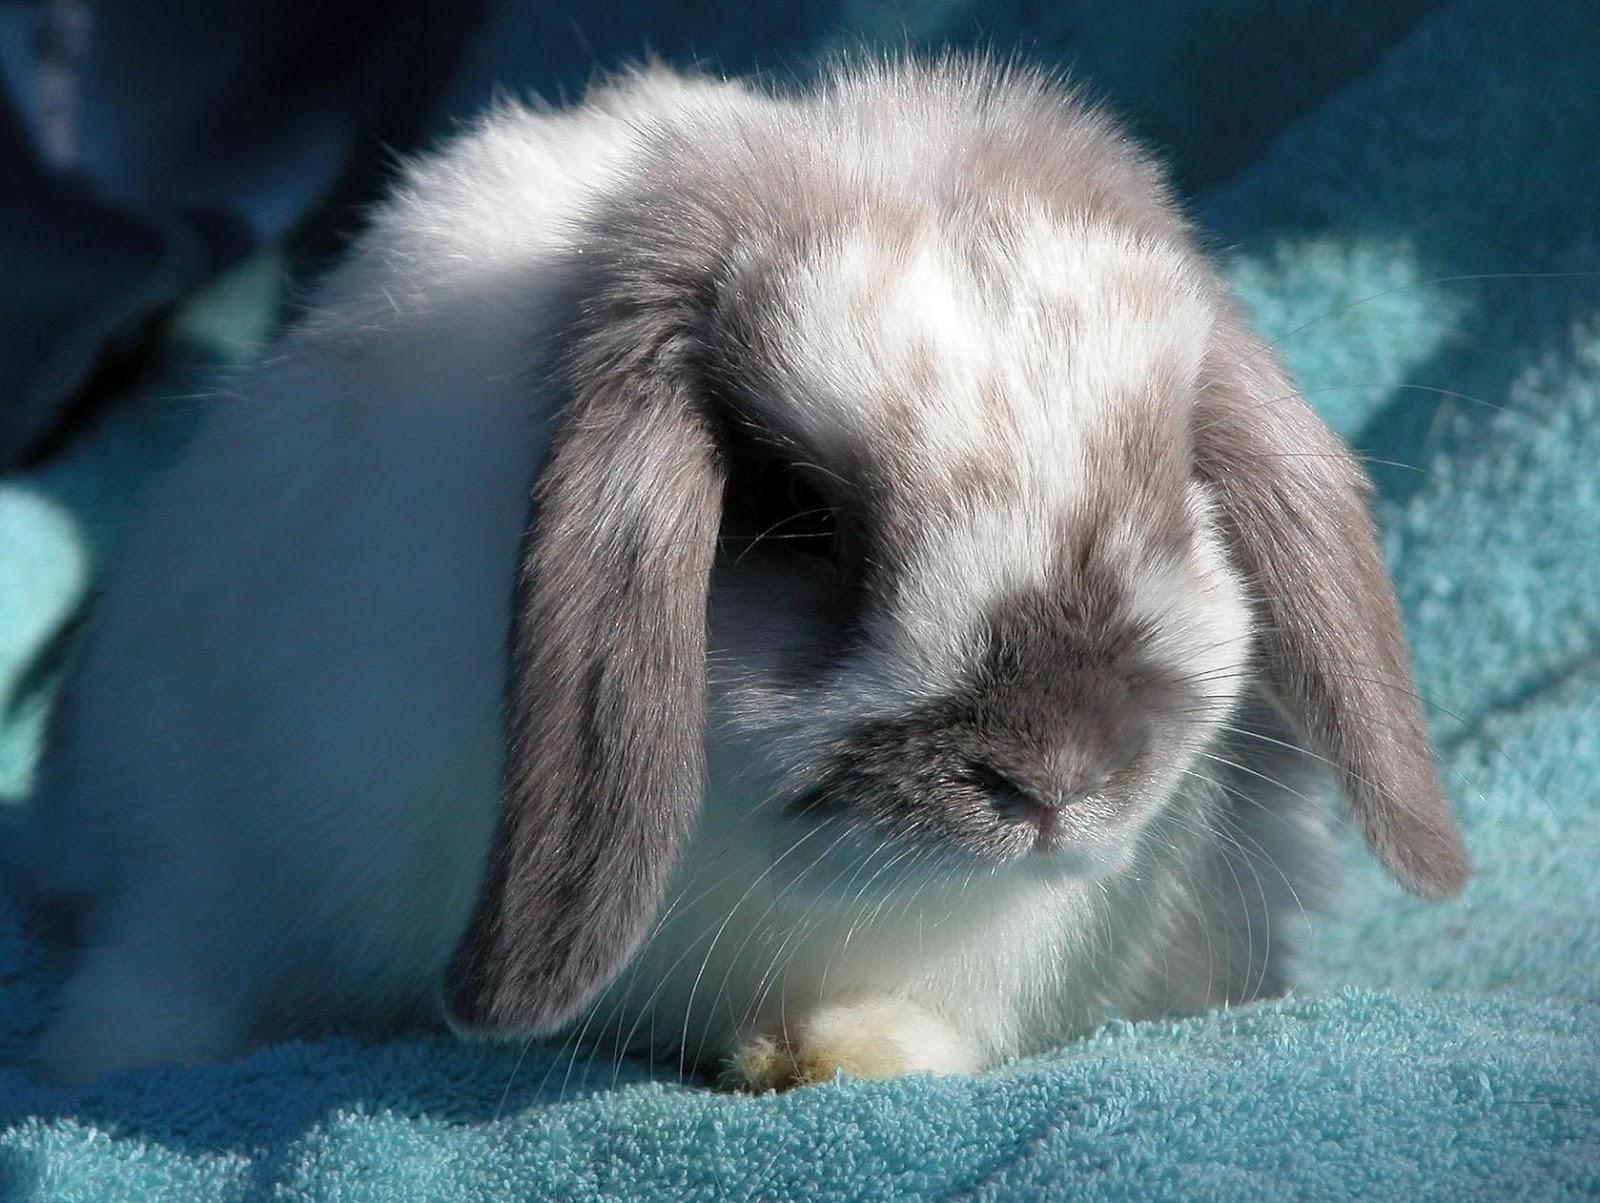 Unique Wallpaper Bunny